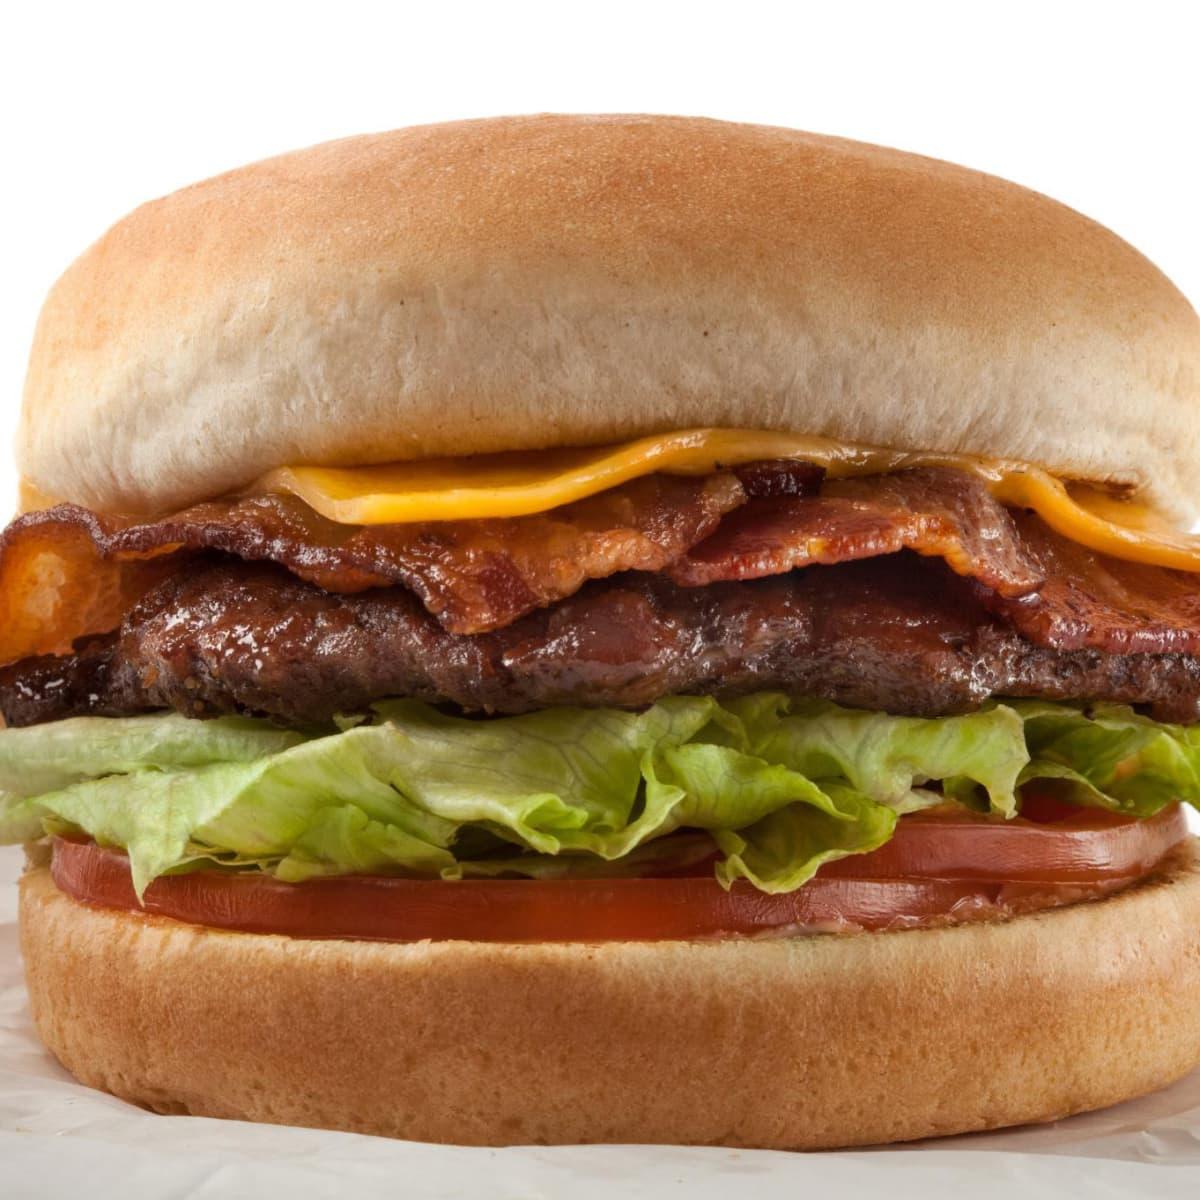 P. Terry's cheeseburger burger